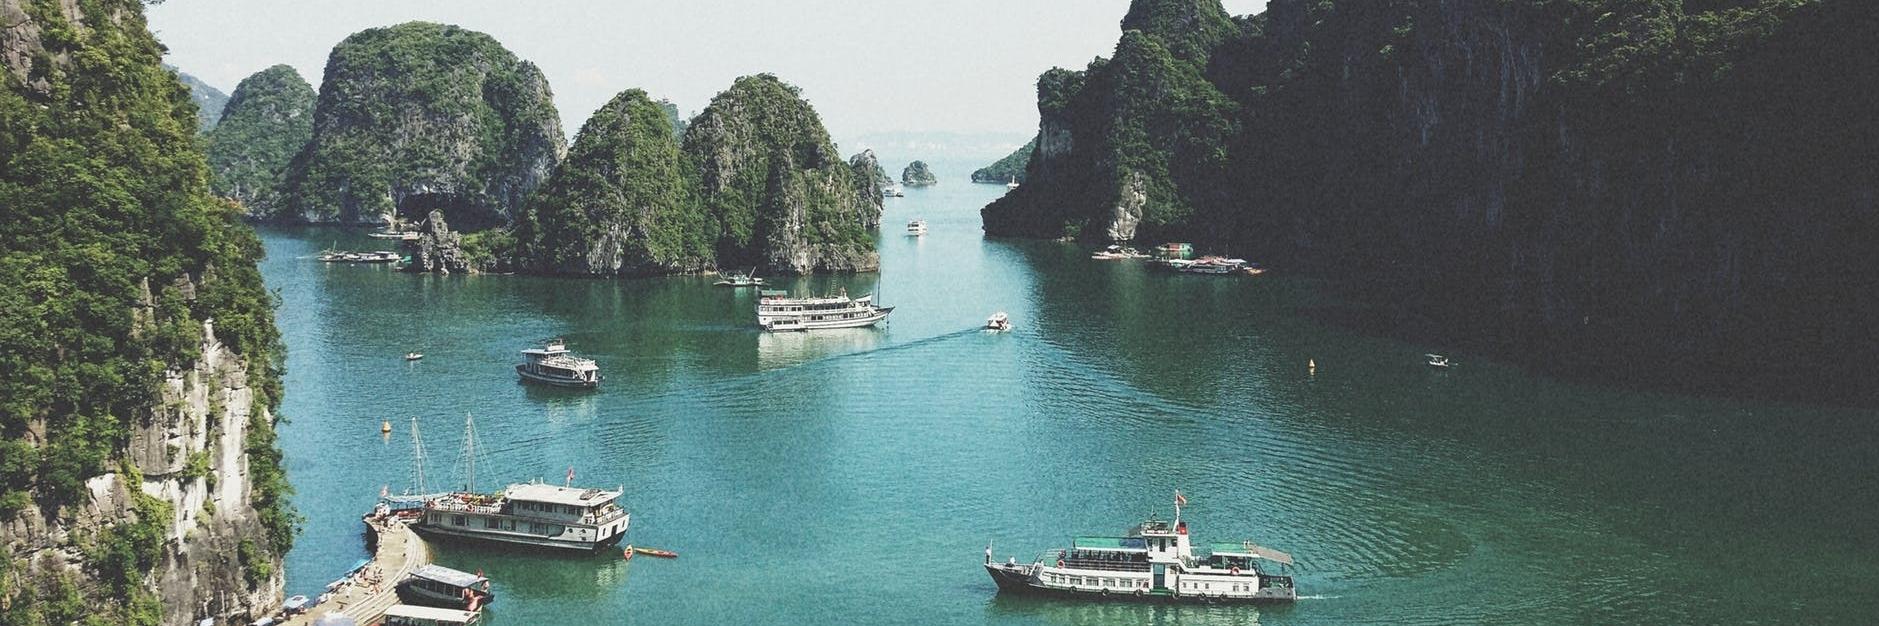 https://gody.vn/blog/vanloc7437/post/review-mot-ngay-kham-pha-vinh-ha-long-3854